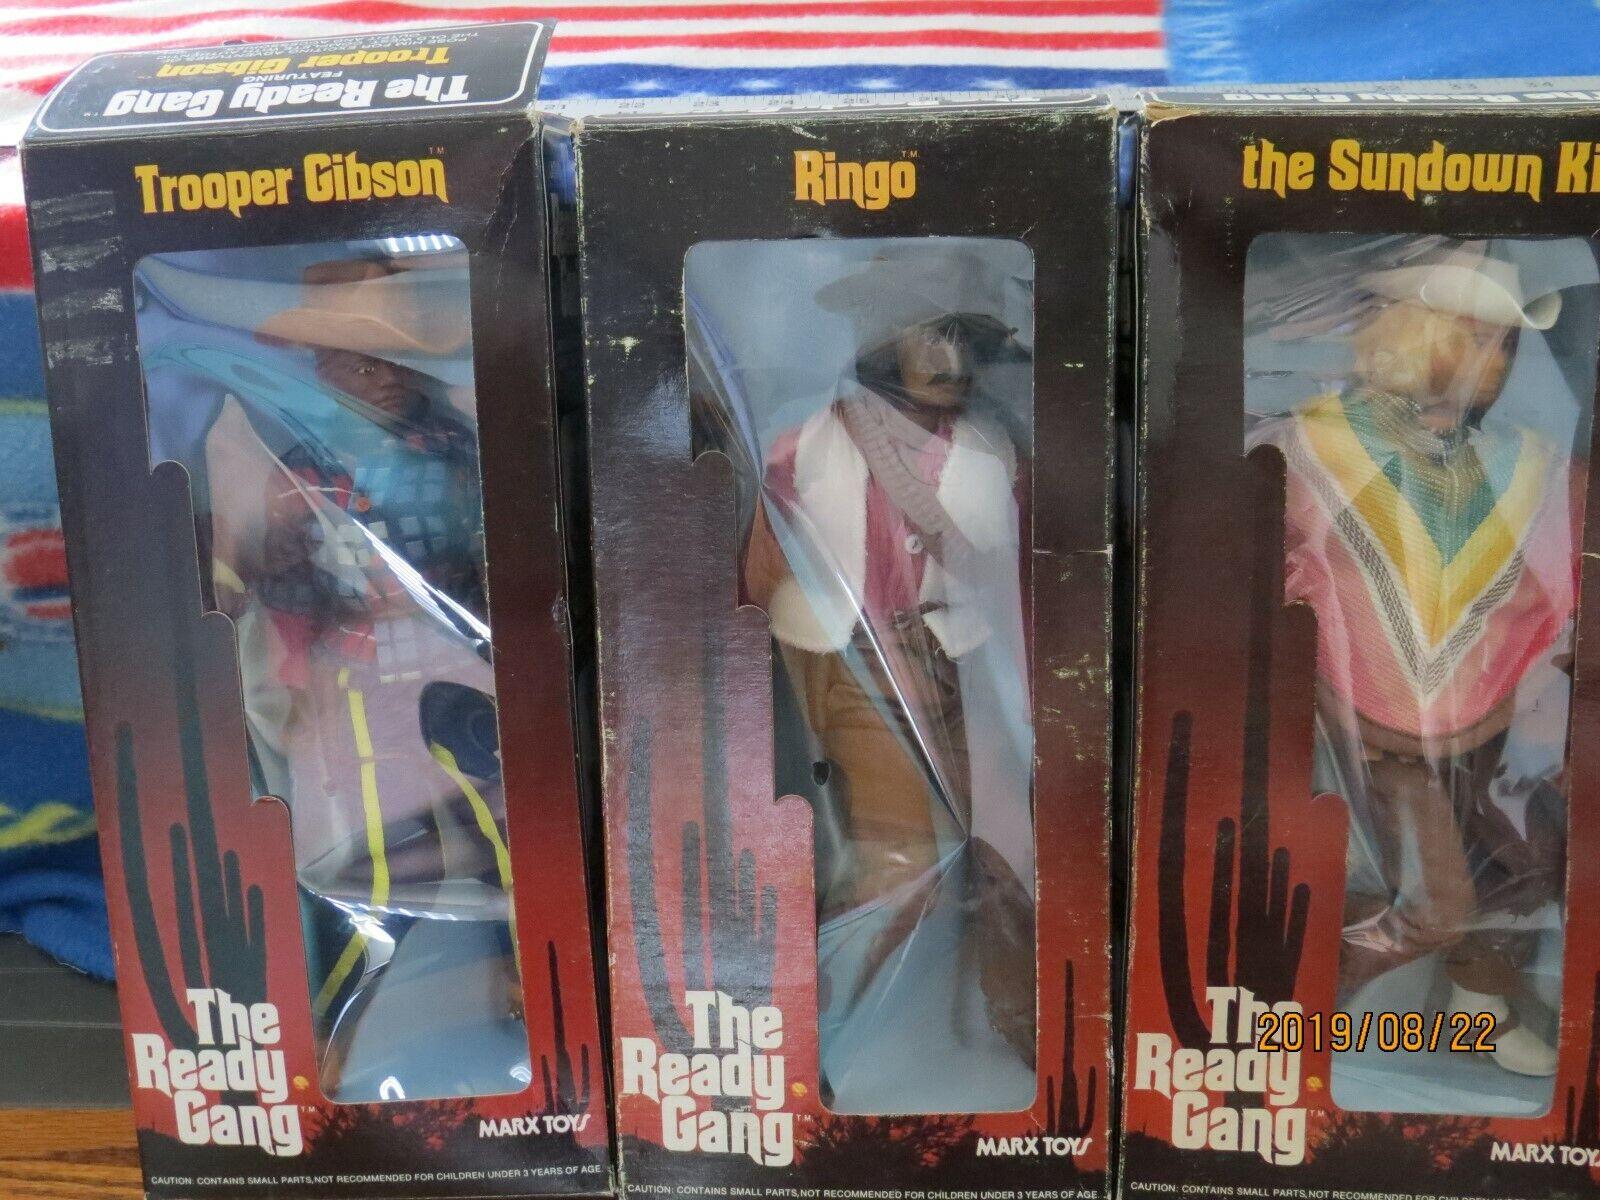 THE READY GANG SET OF THREE FIGURES BOXED RINGO - TROOPER GIBSON - SUNDOWN KID